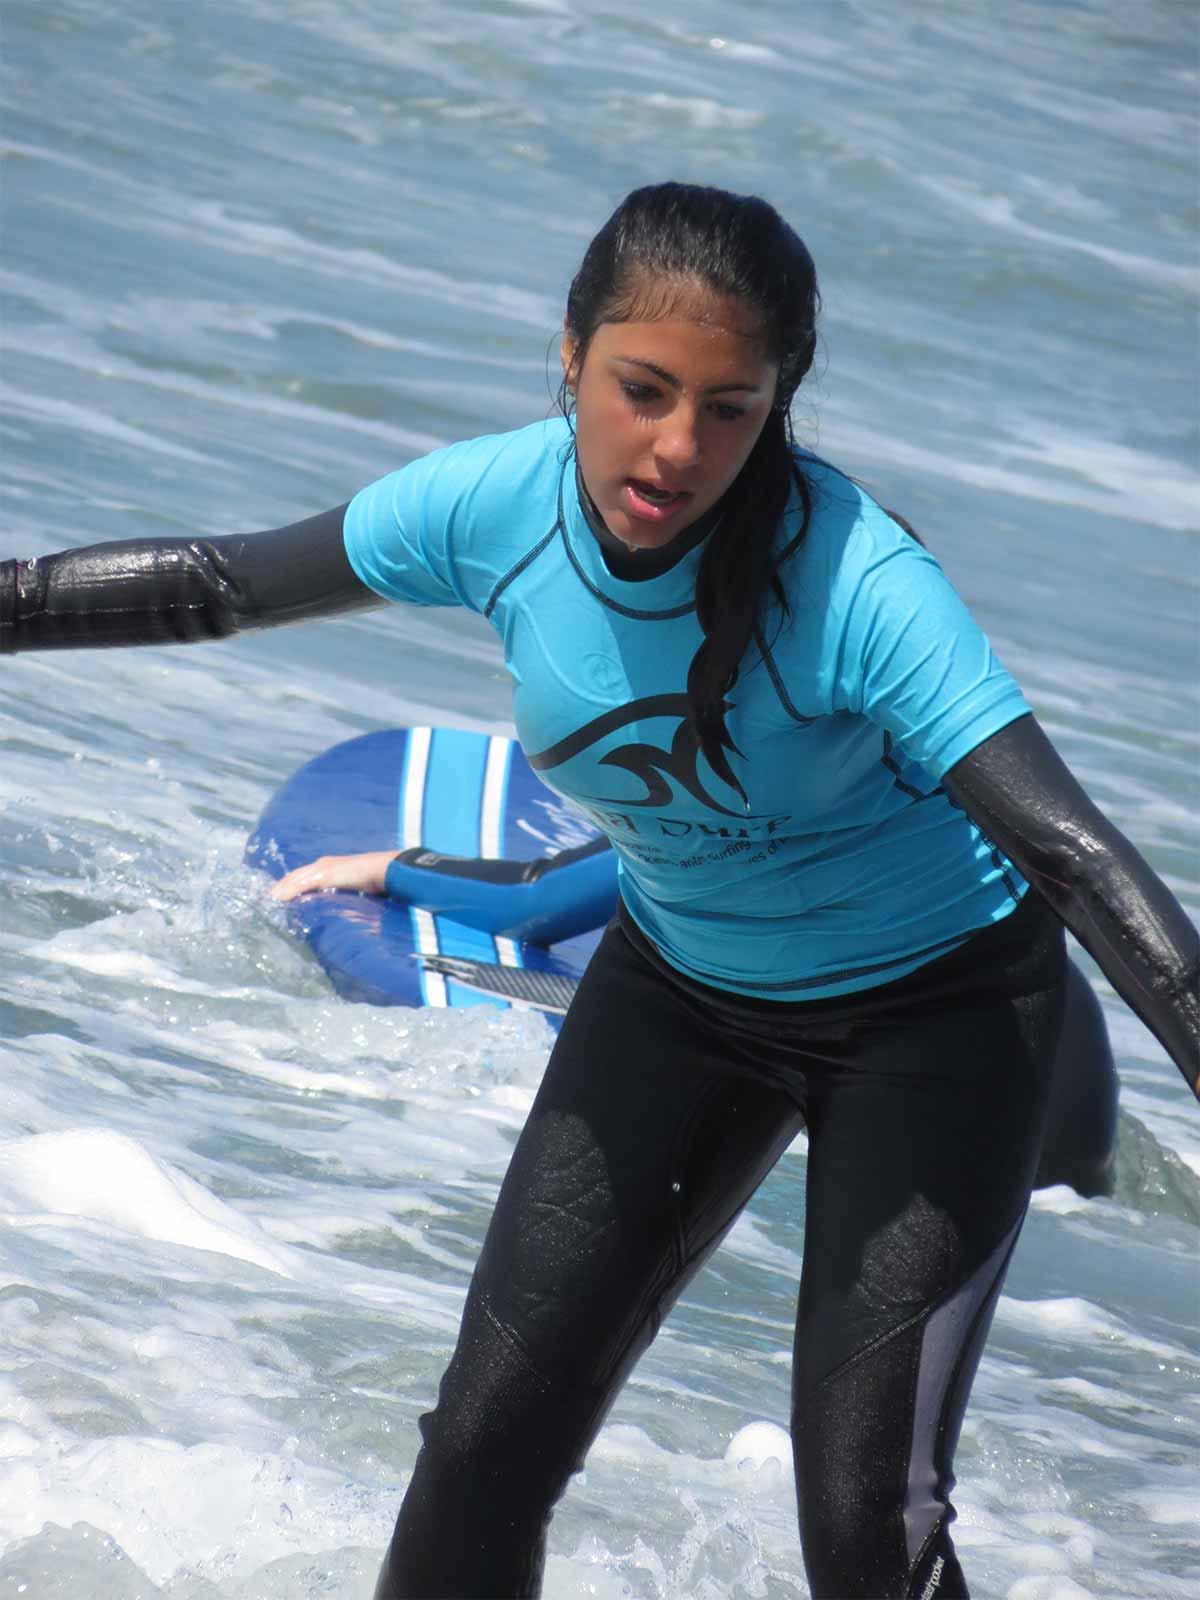 teenager-surf-lessons.jpg